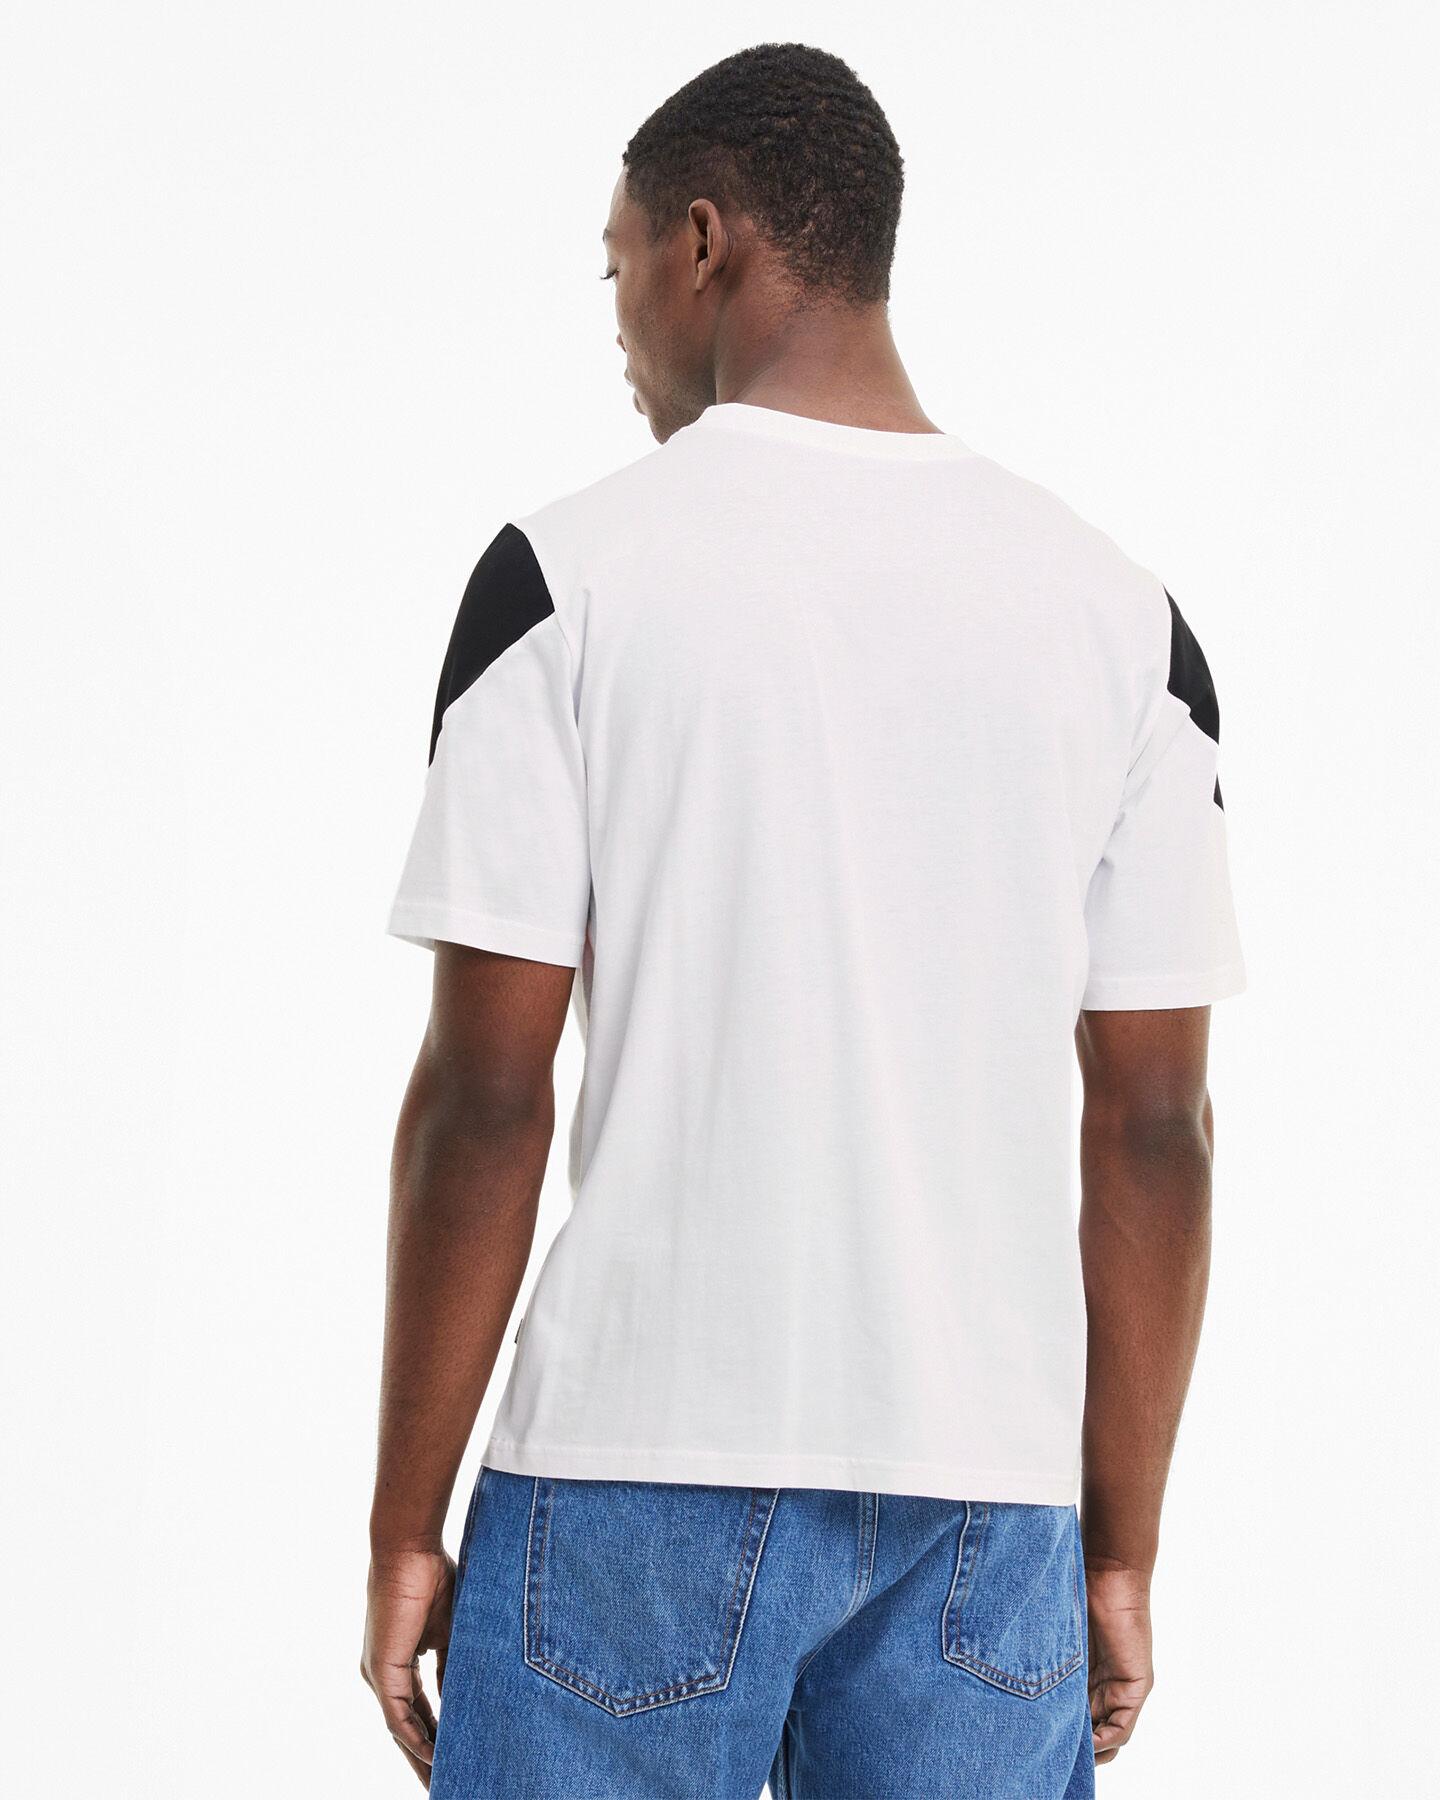 T-Shirt PUMA REBEL ADVANCED M S5235149 scatto 6